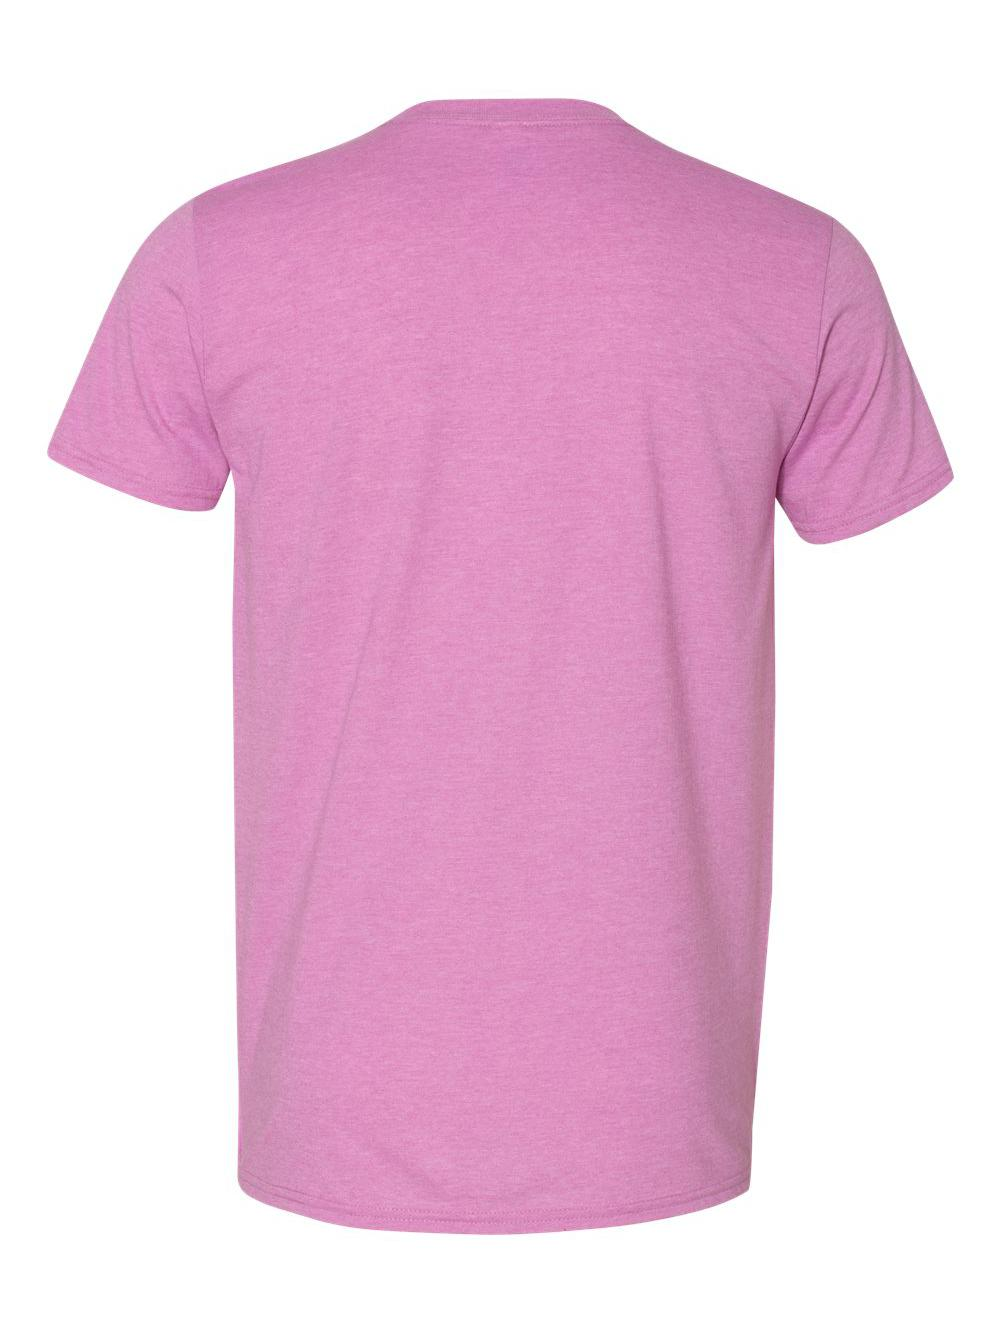 Gildan-Softstyle-T-Shirt-64000 thumbnail 73